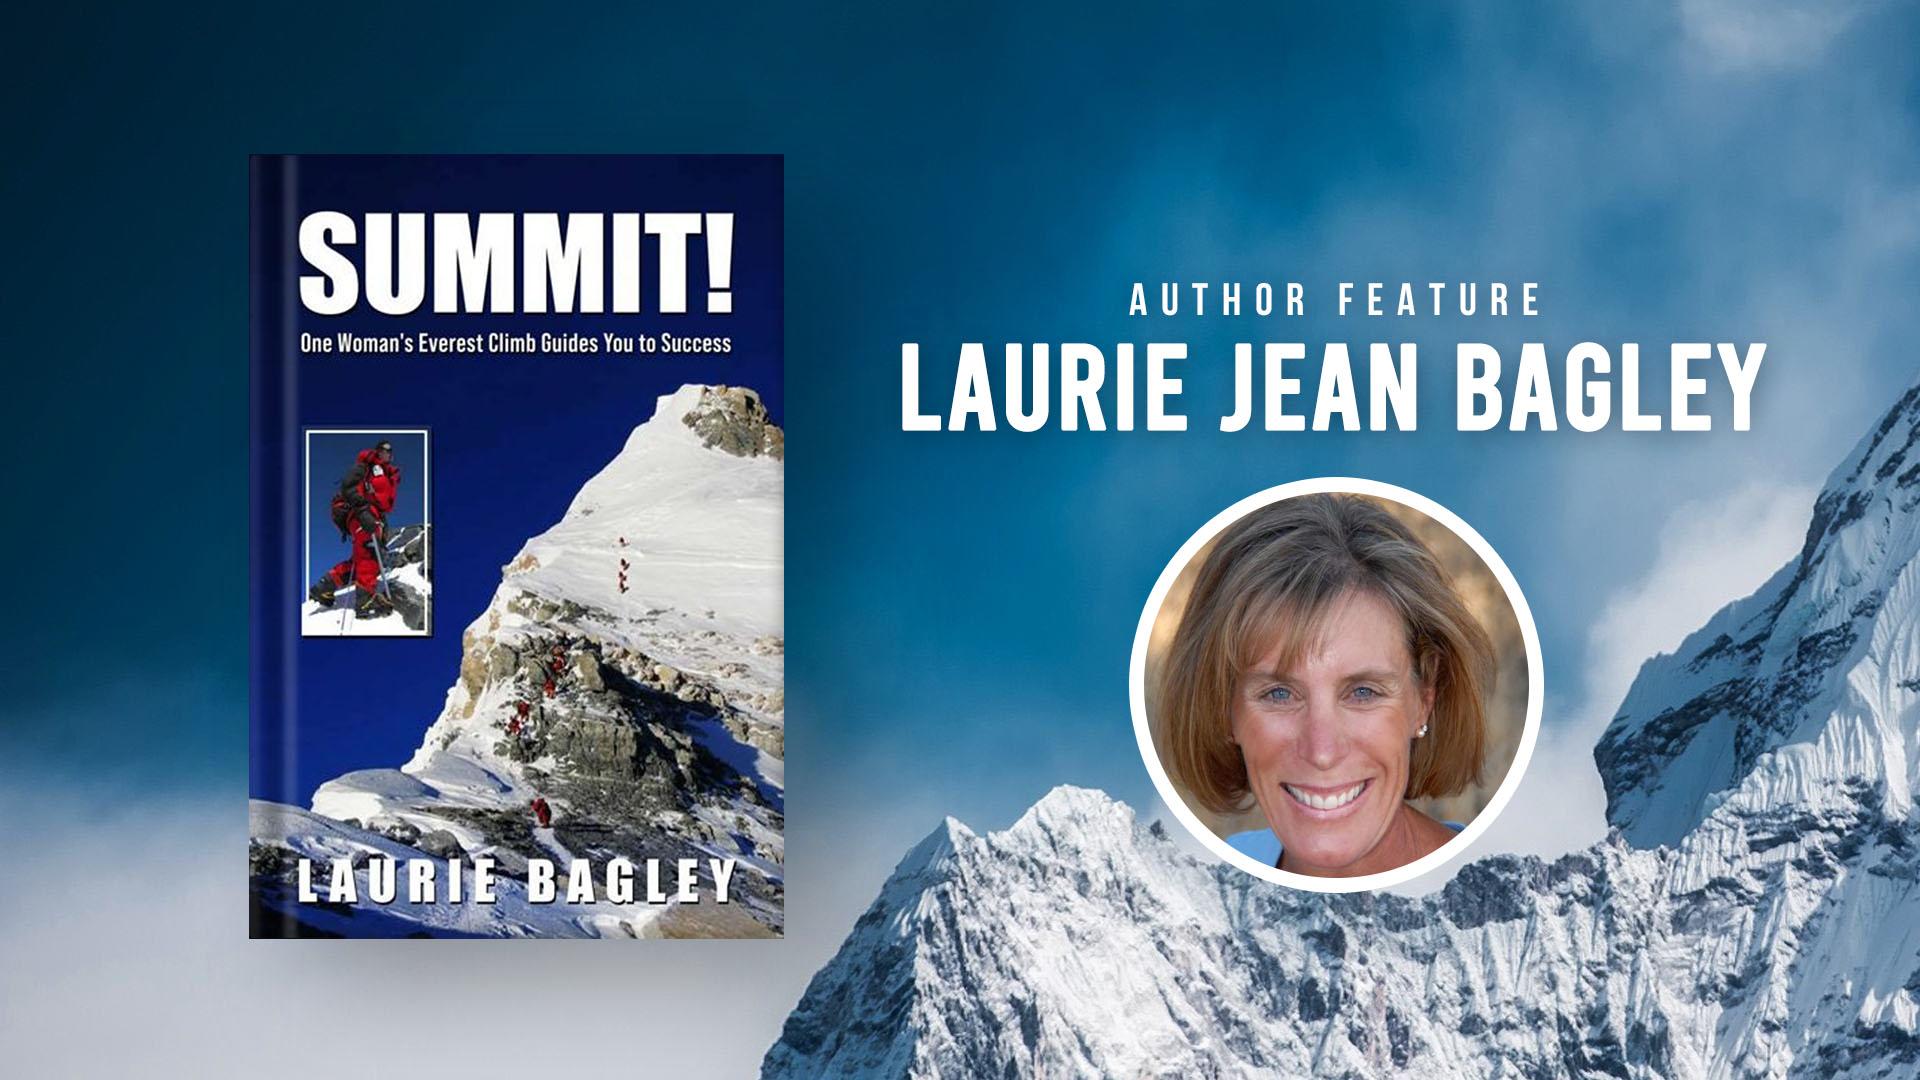 Laurie Jean Bagley